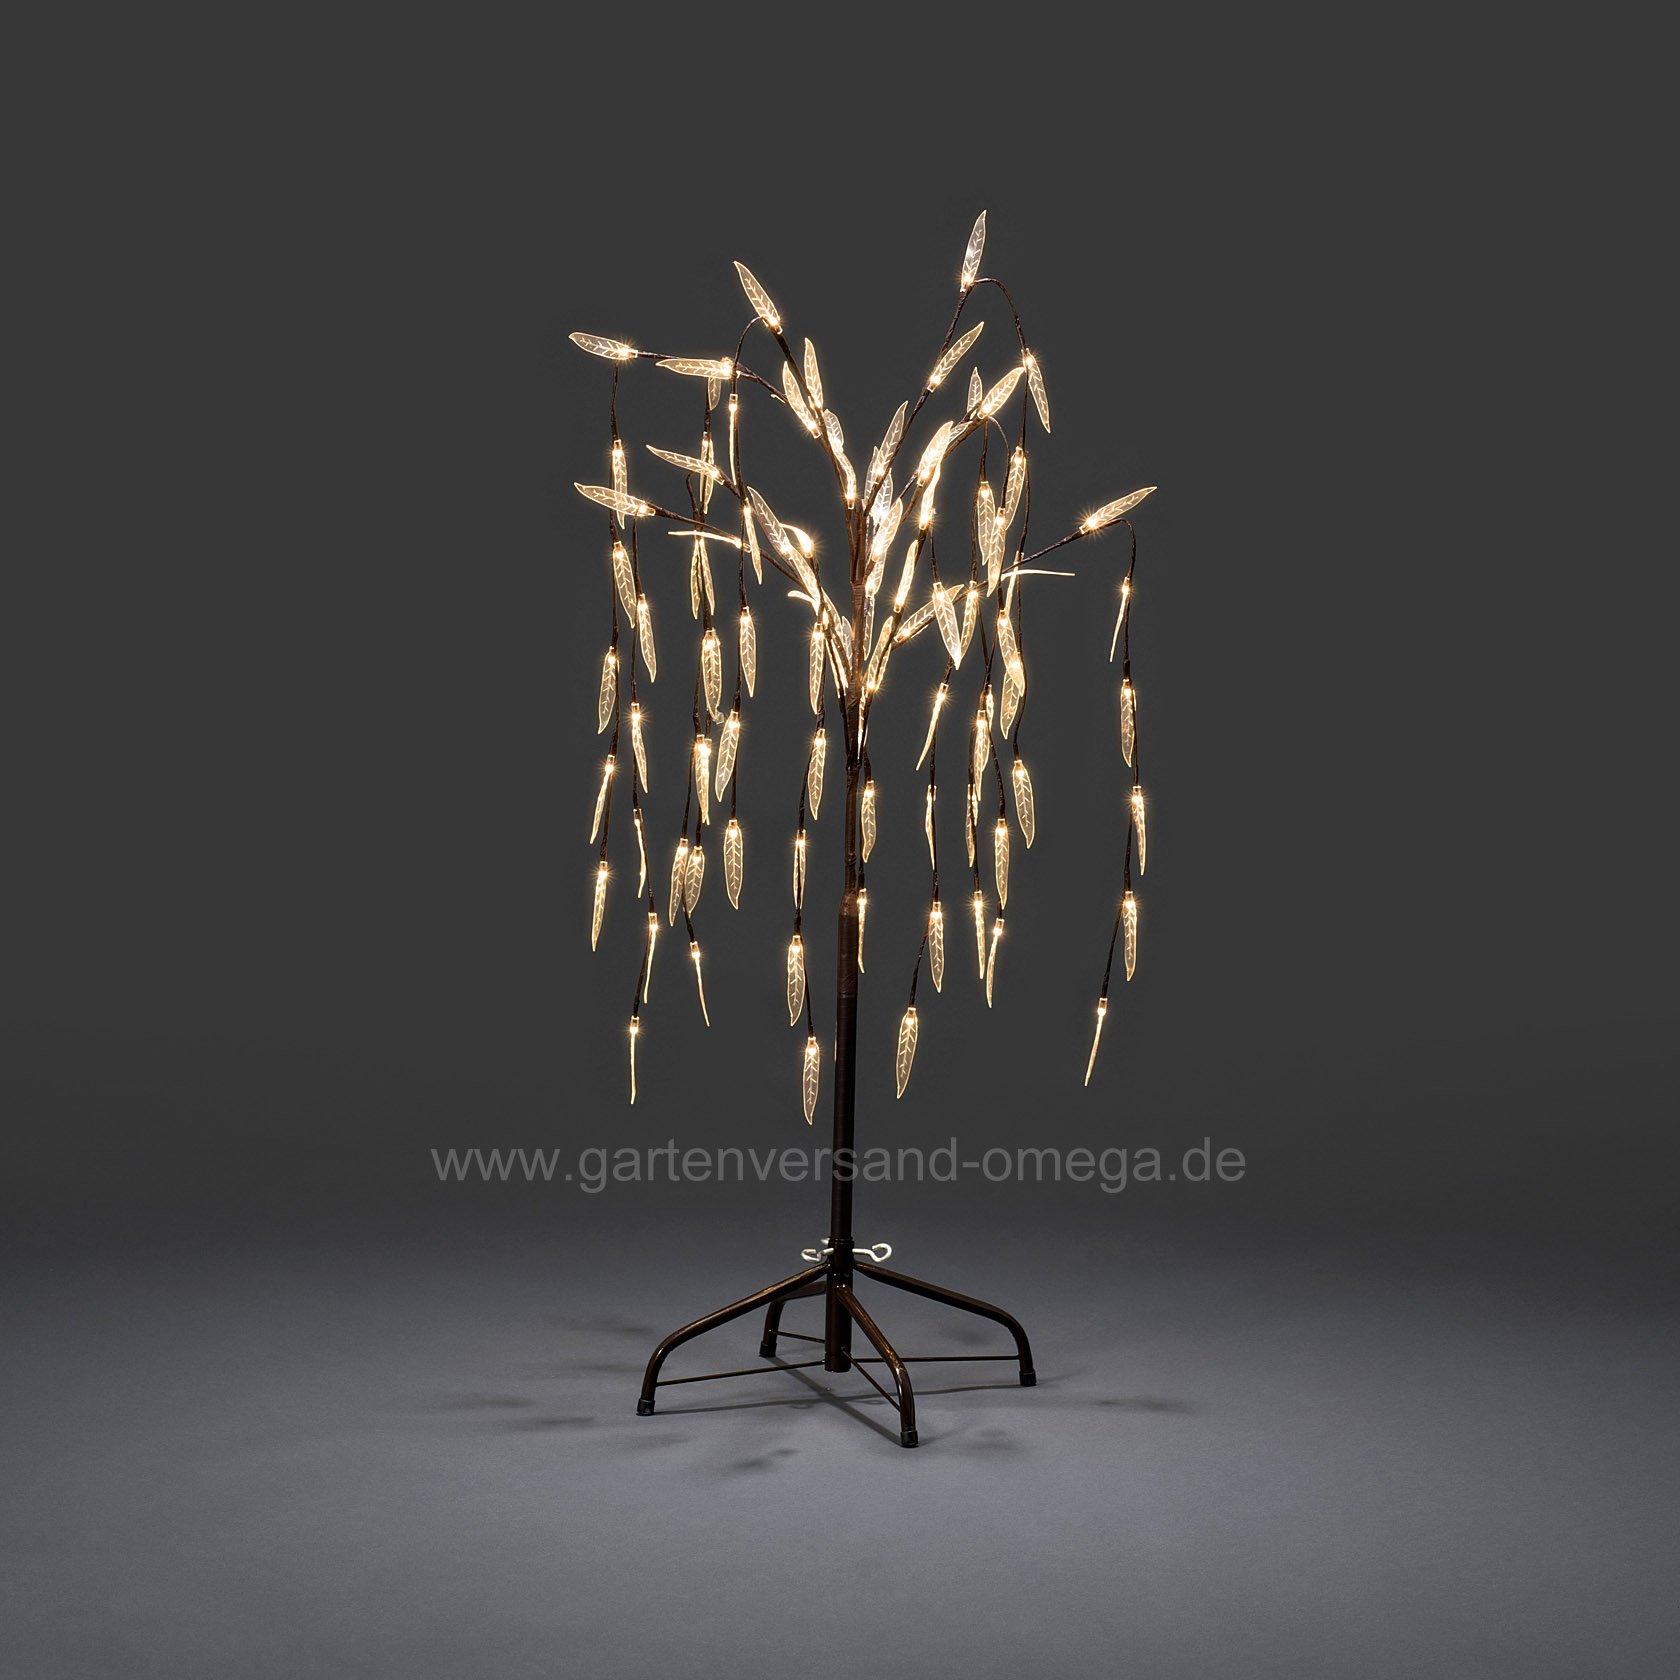 led trauerweide 100cm led baum leuchtbaum beleuchteter baum led lichterbaum baum. Black Bedroom Furniture Sets. Home Design Ideas